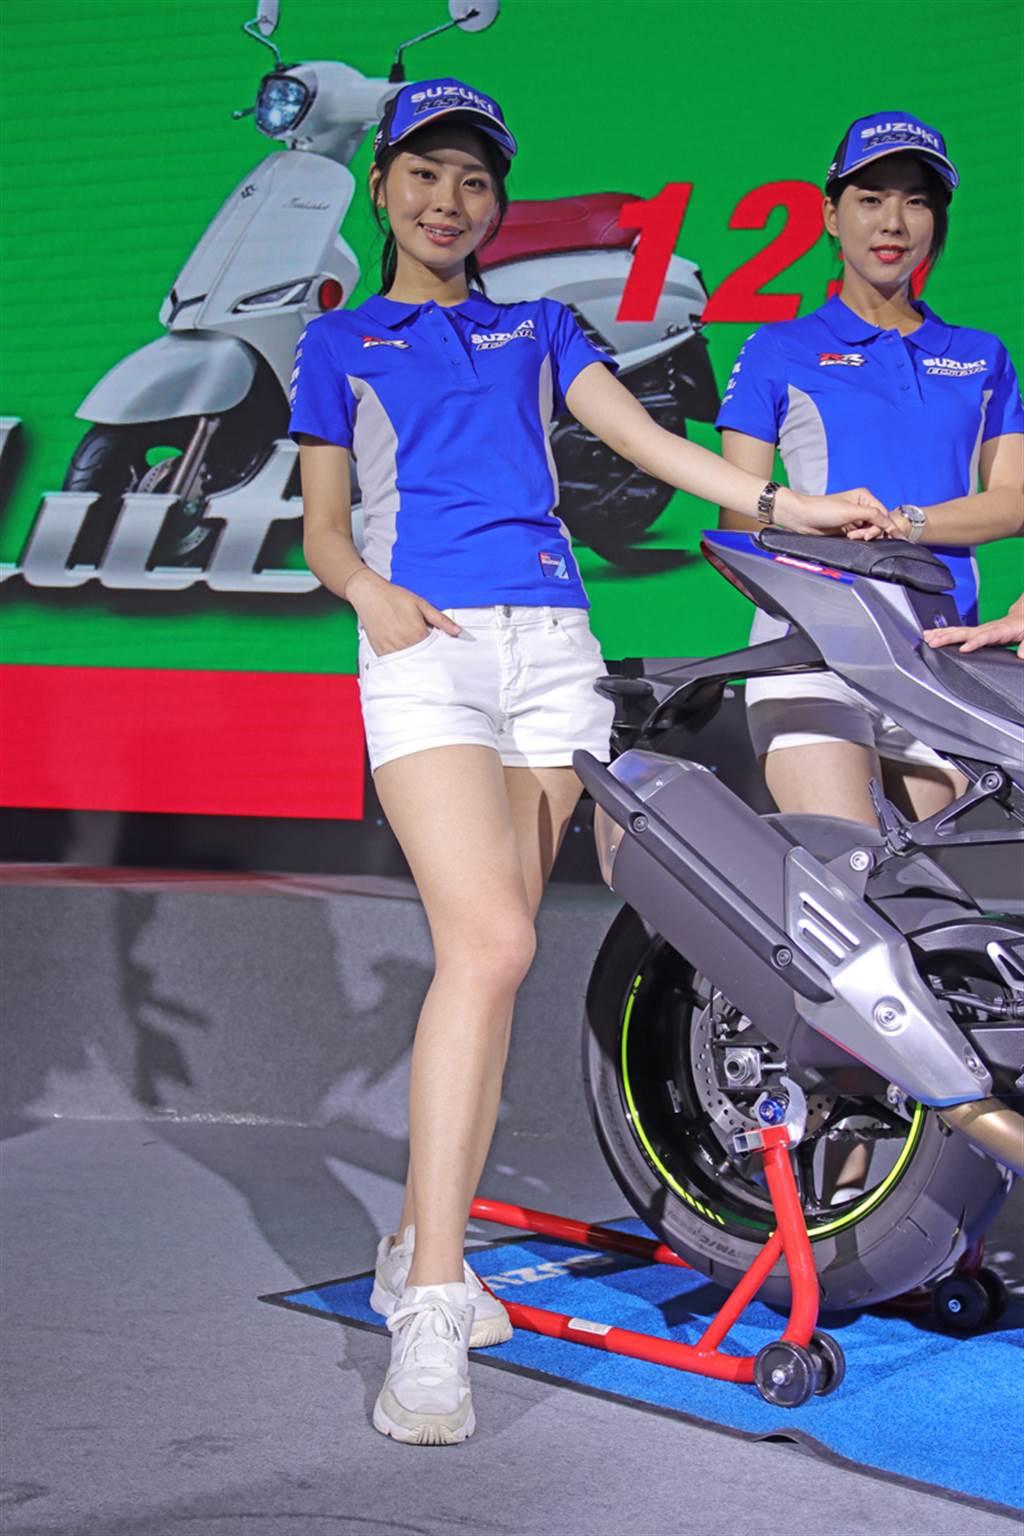 Suzuki建廠百年慶生活動 台鈴機車推出5款新車回饋粉絲